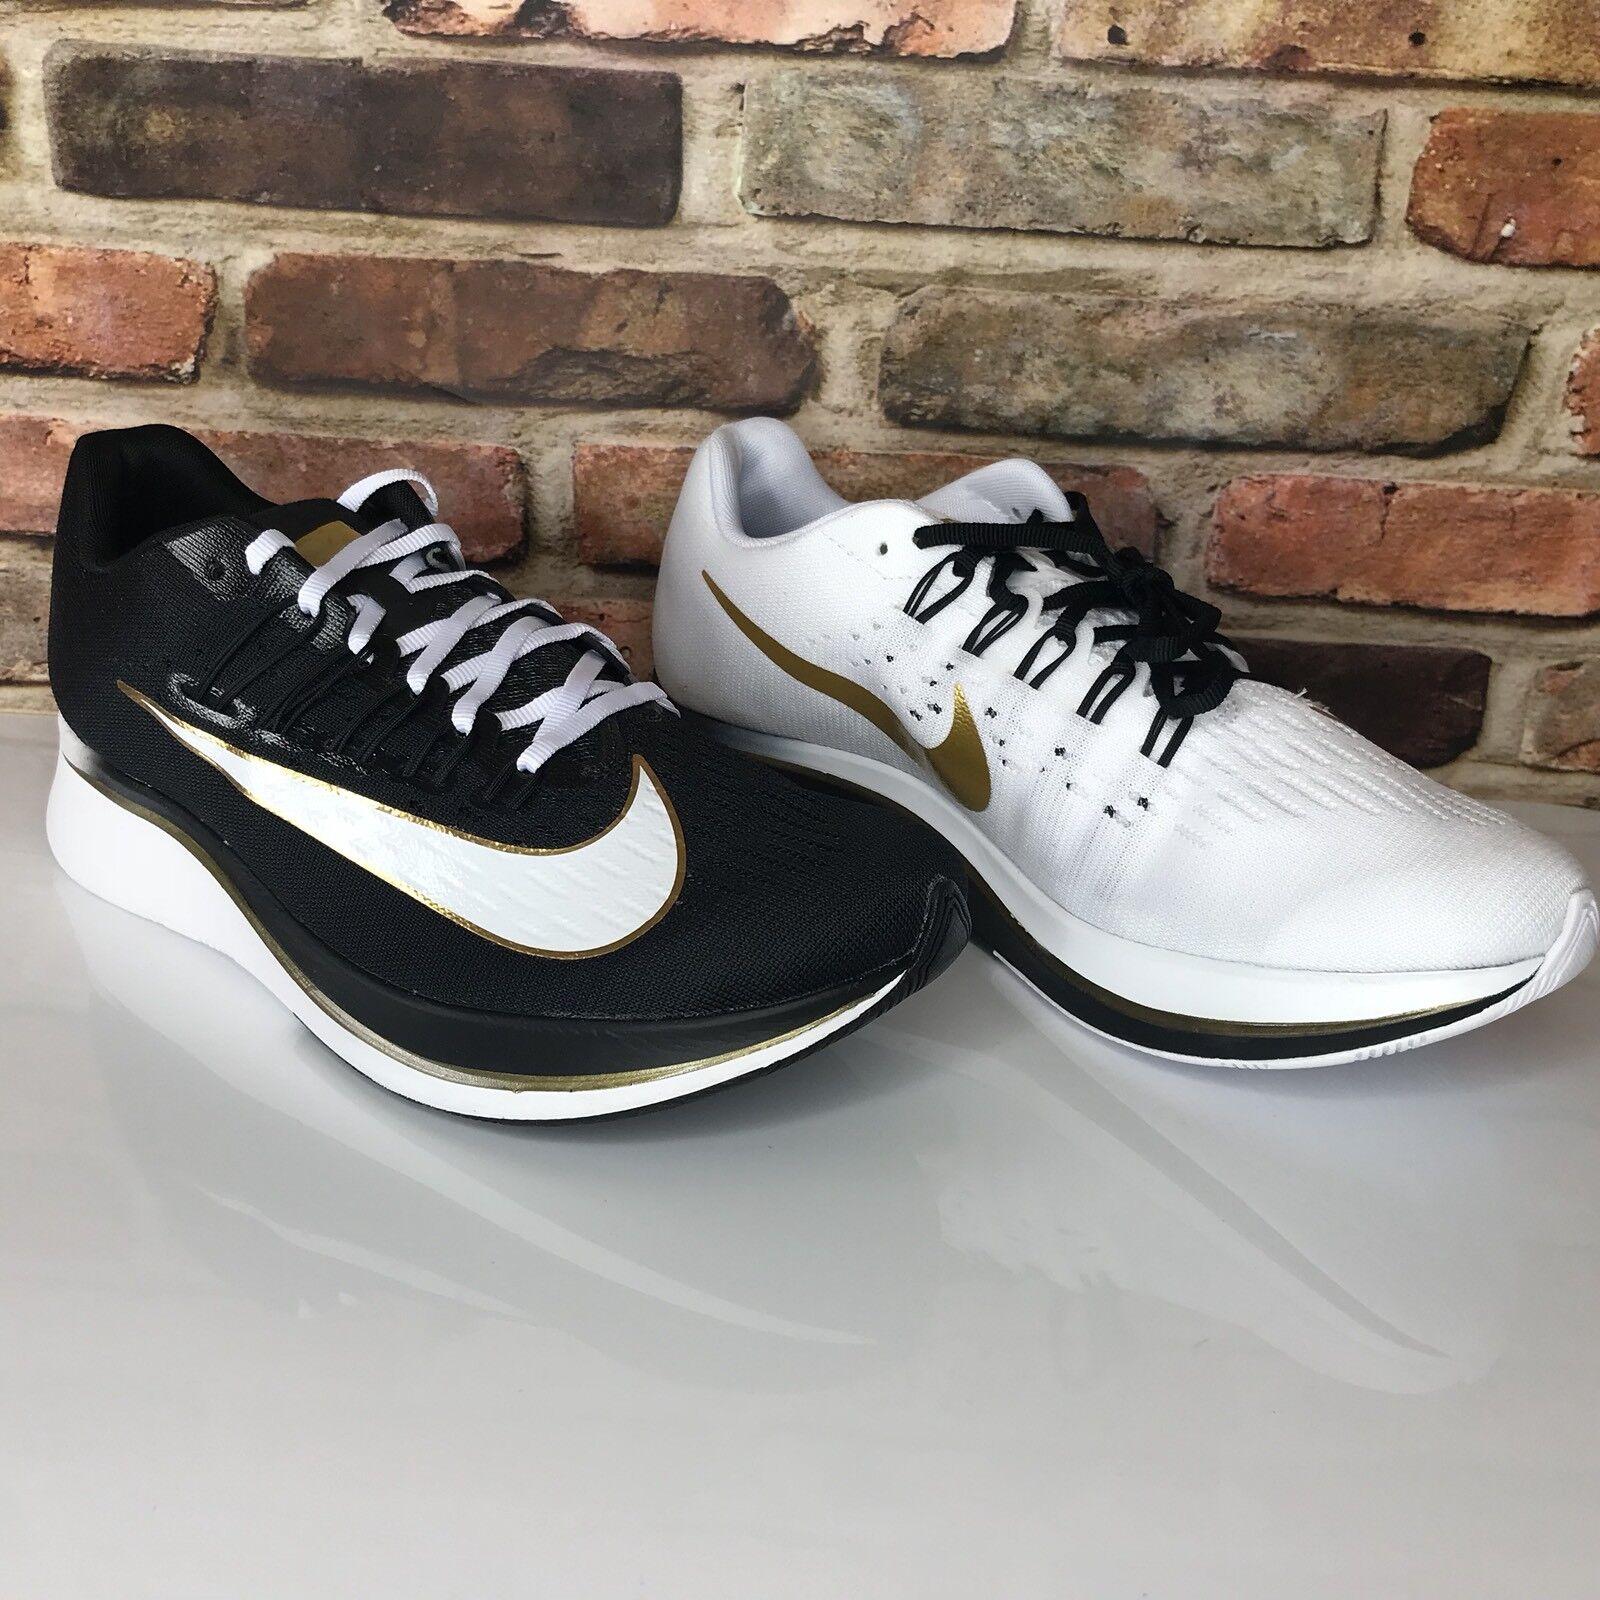 Nike Zoom Fly MISMATCH Mens Size 7.5 Black White Metallic gold 880848-006